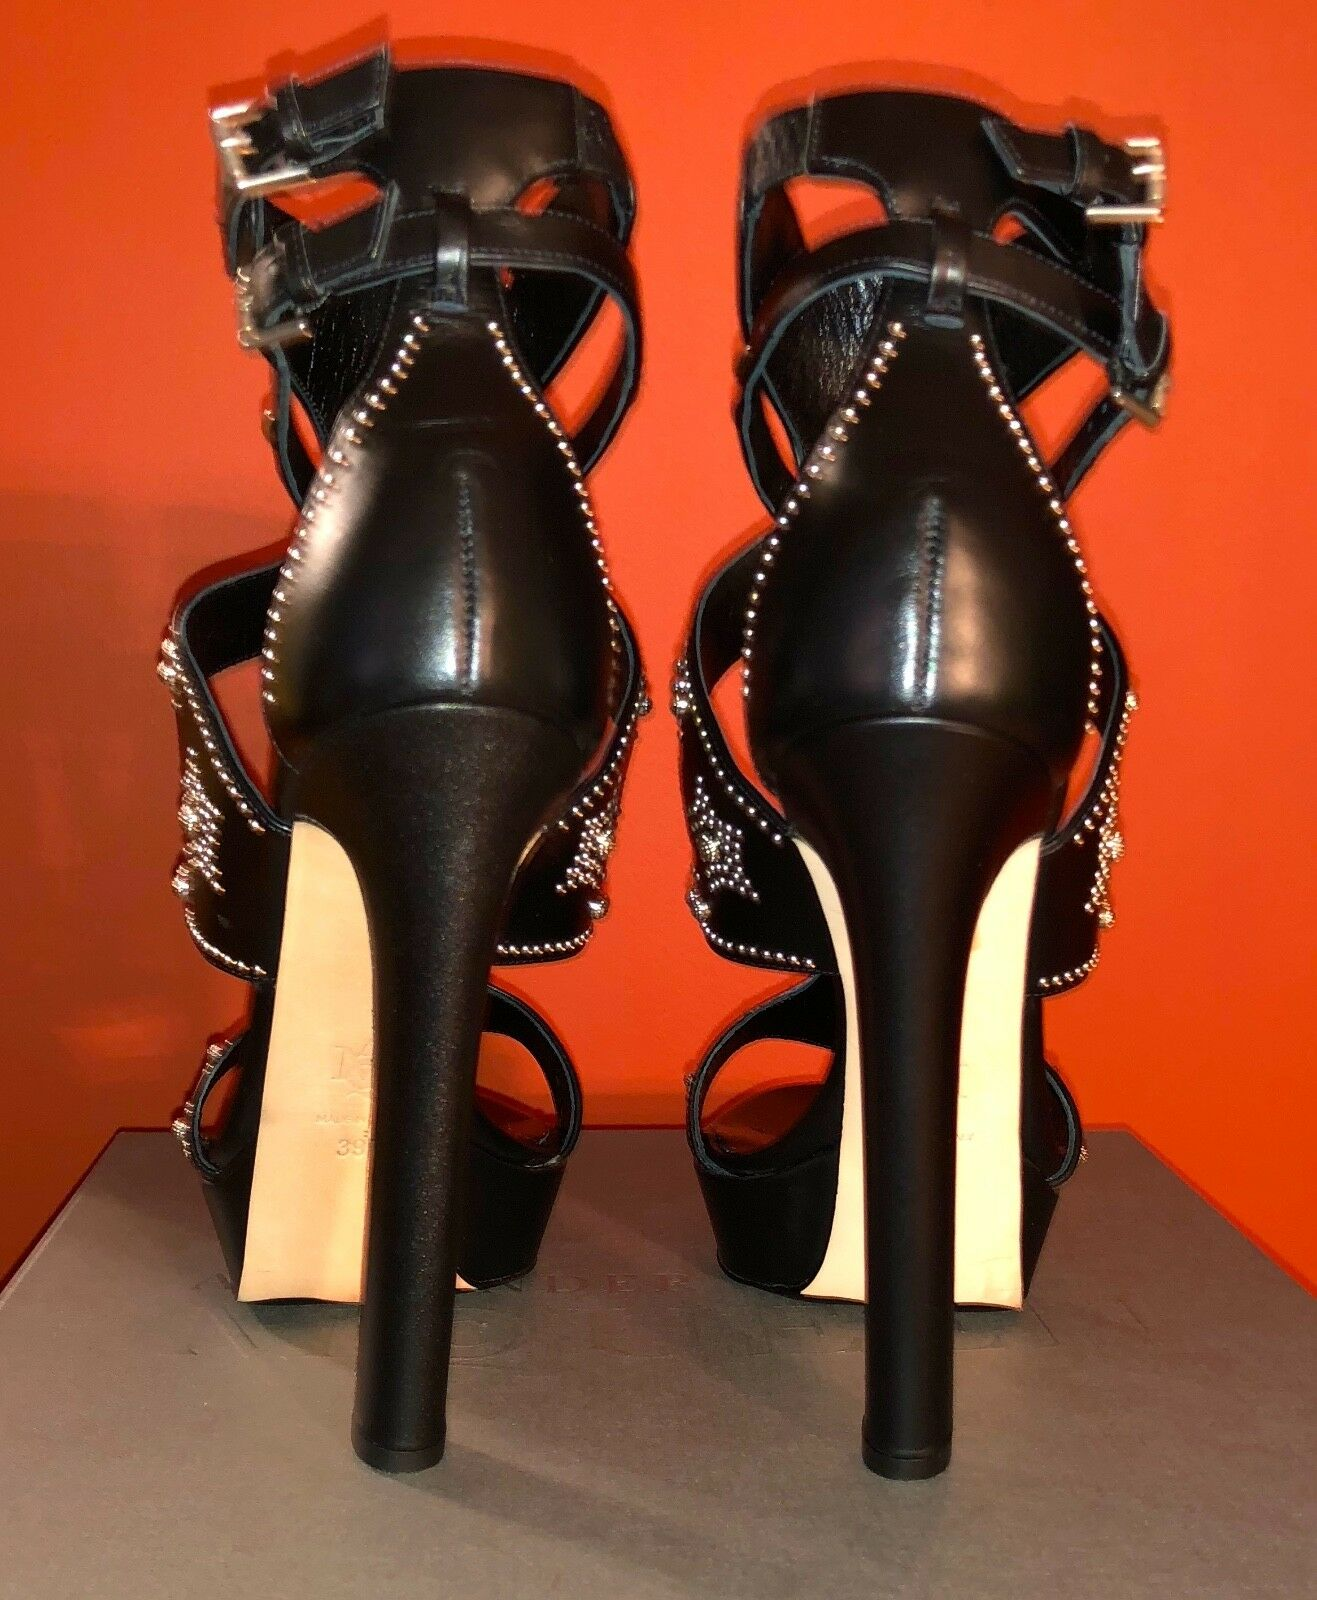 Alexander MQUEEN Black Silver Studs Platform Sandal Booties shoes 39 39 39 096153